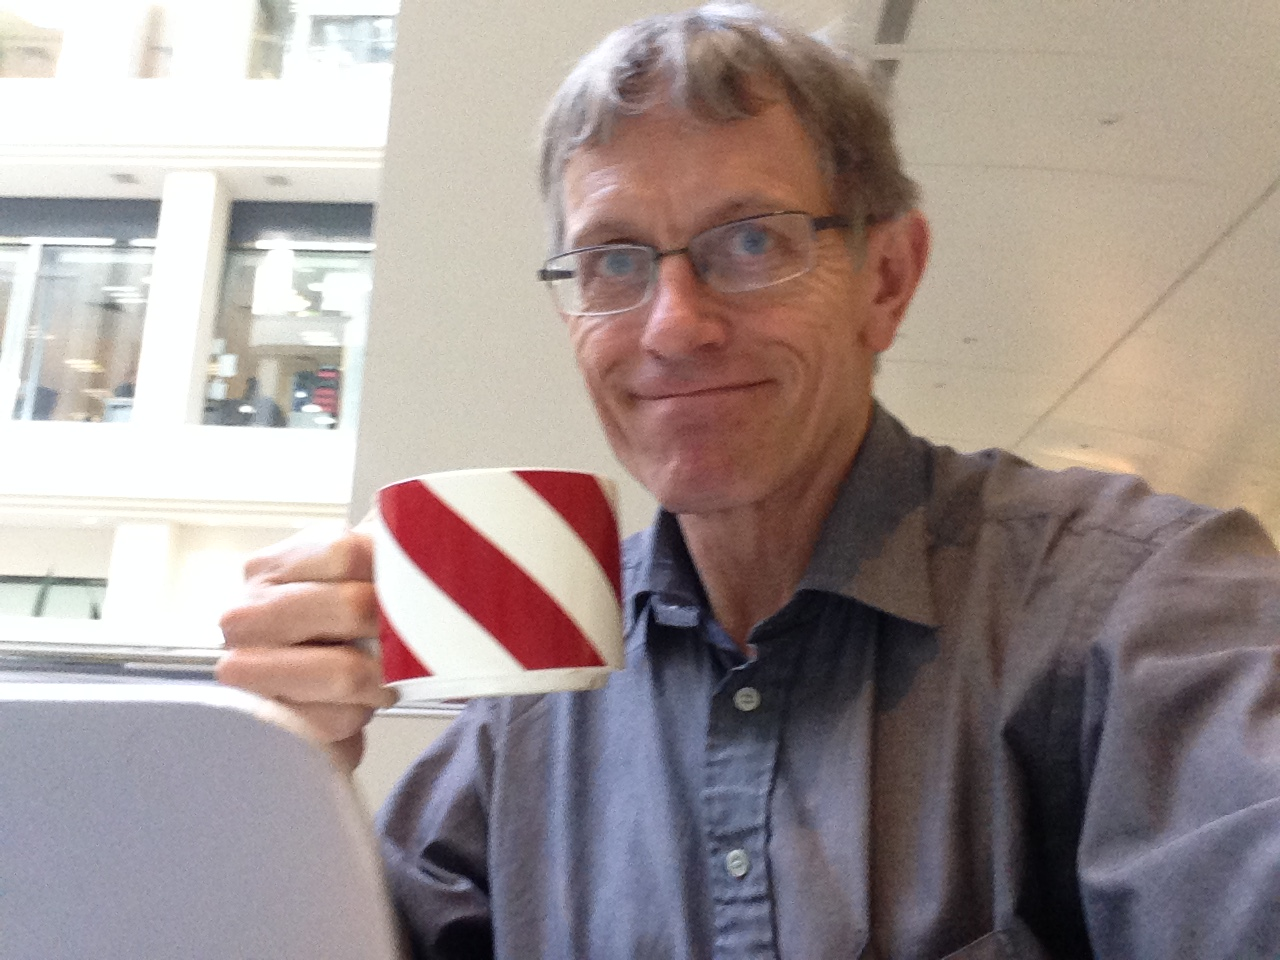 Simon Calder, Travel Writer and Broadcaster